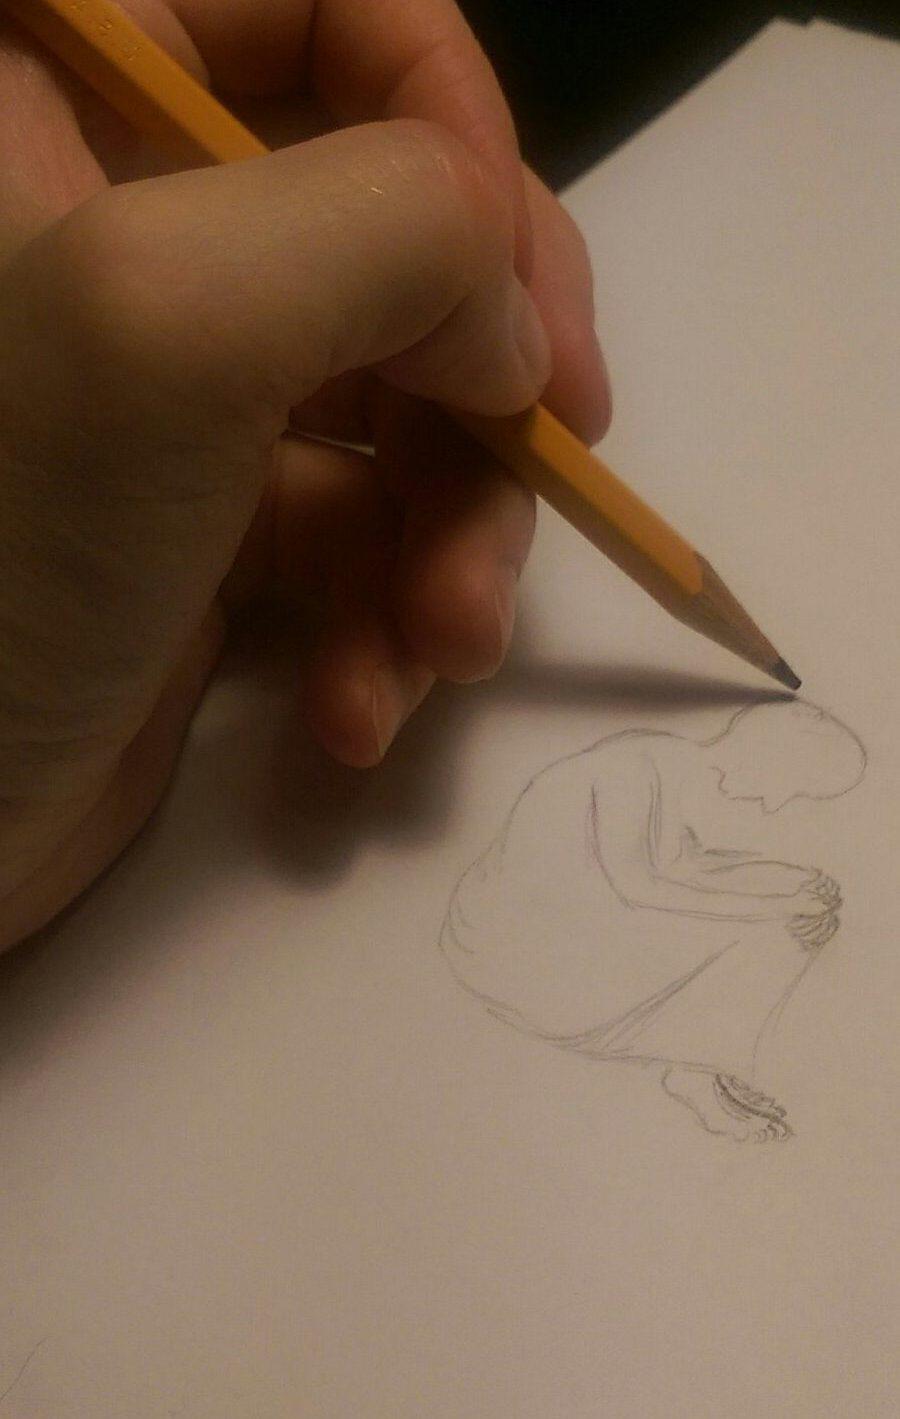 Drawn see – Drawn to to Drawn